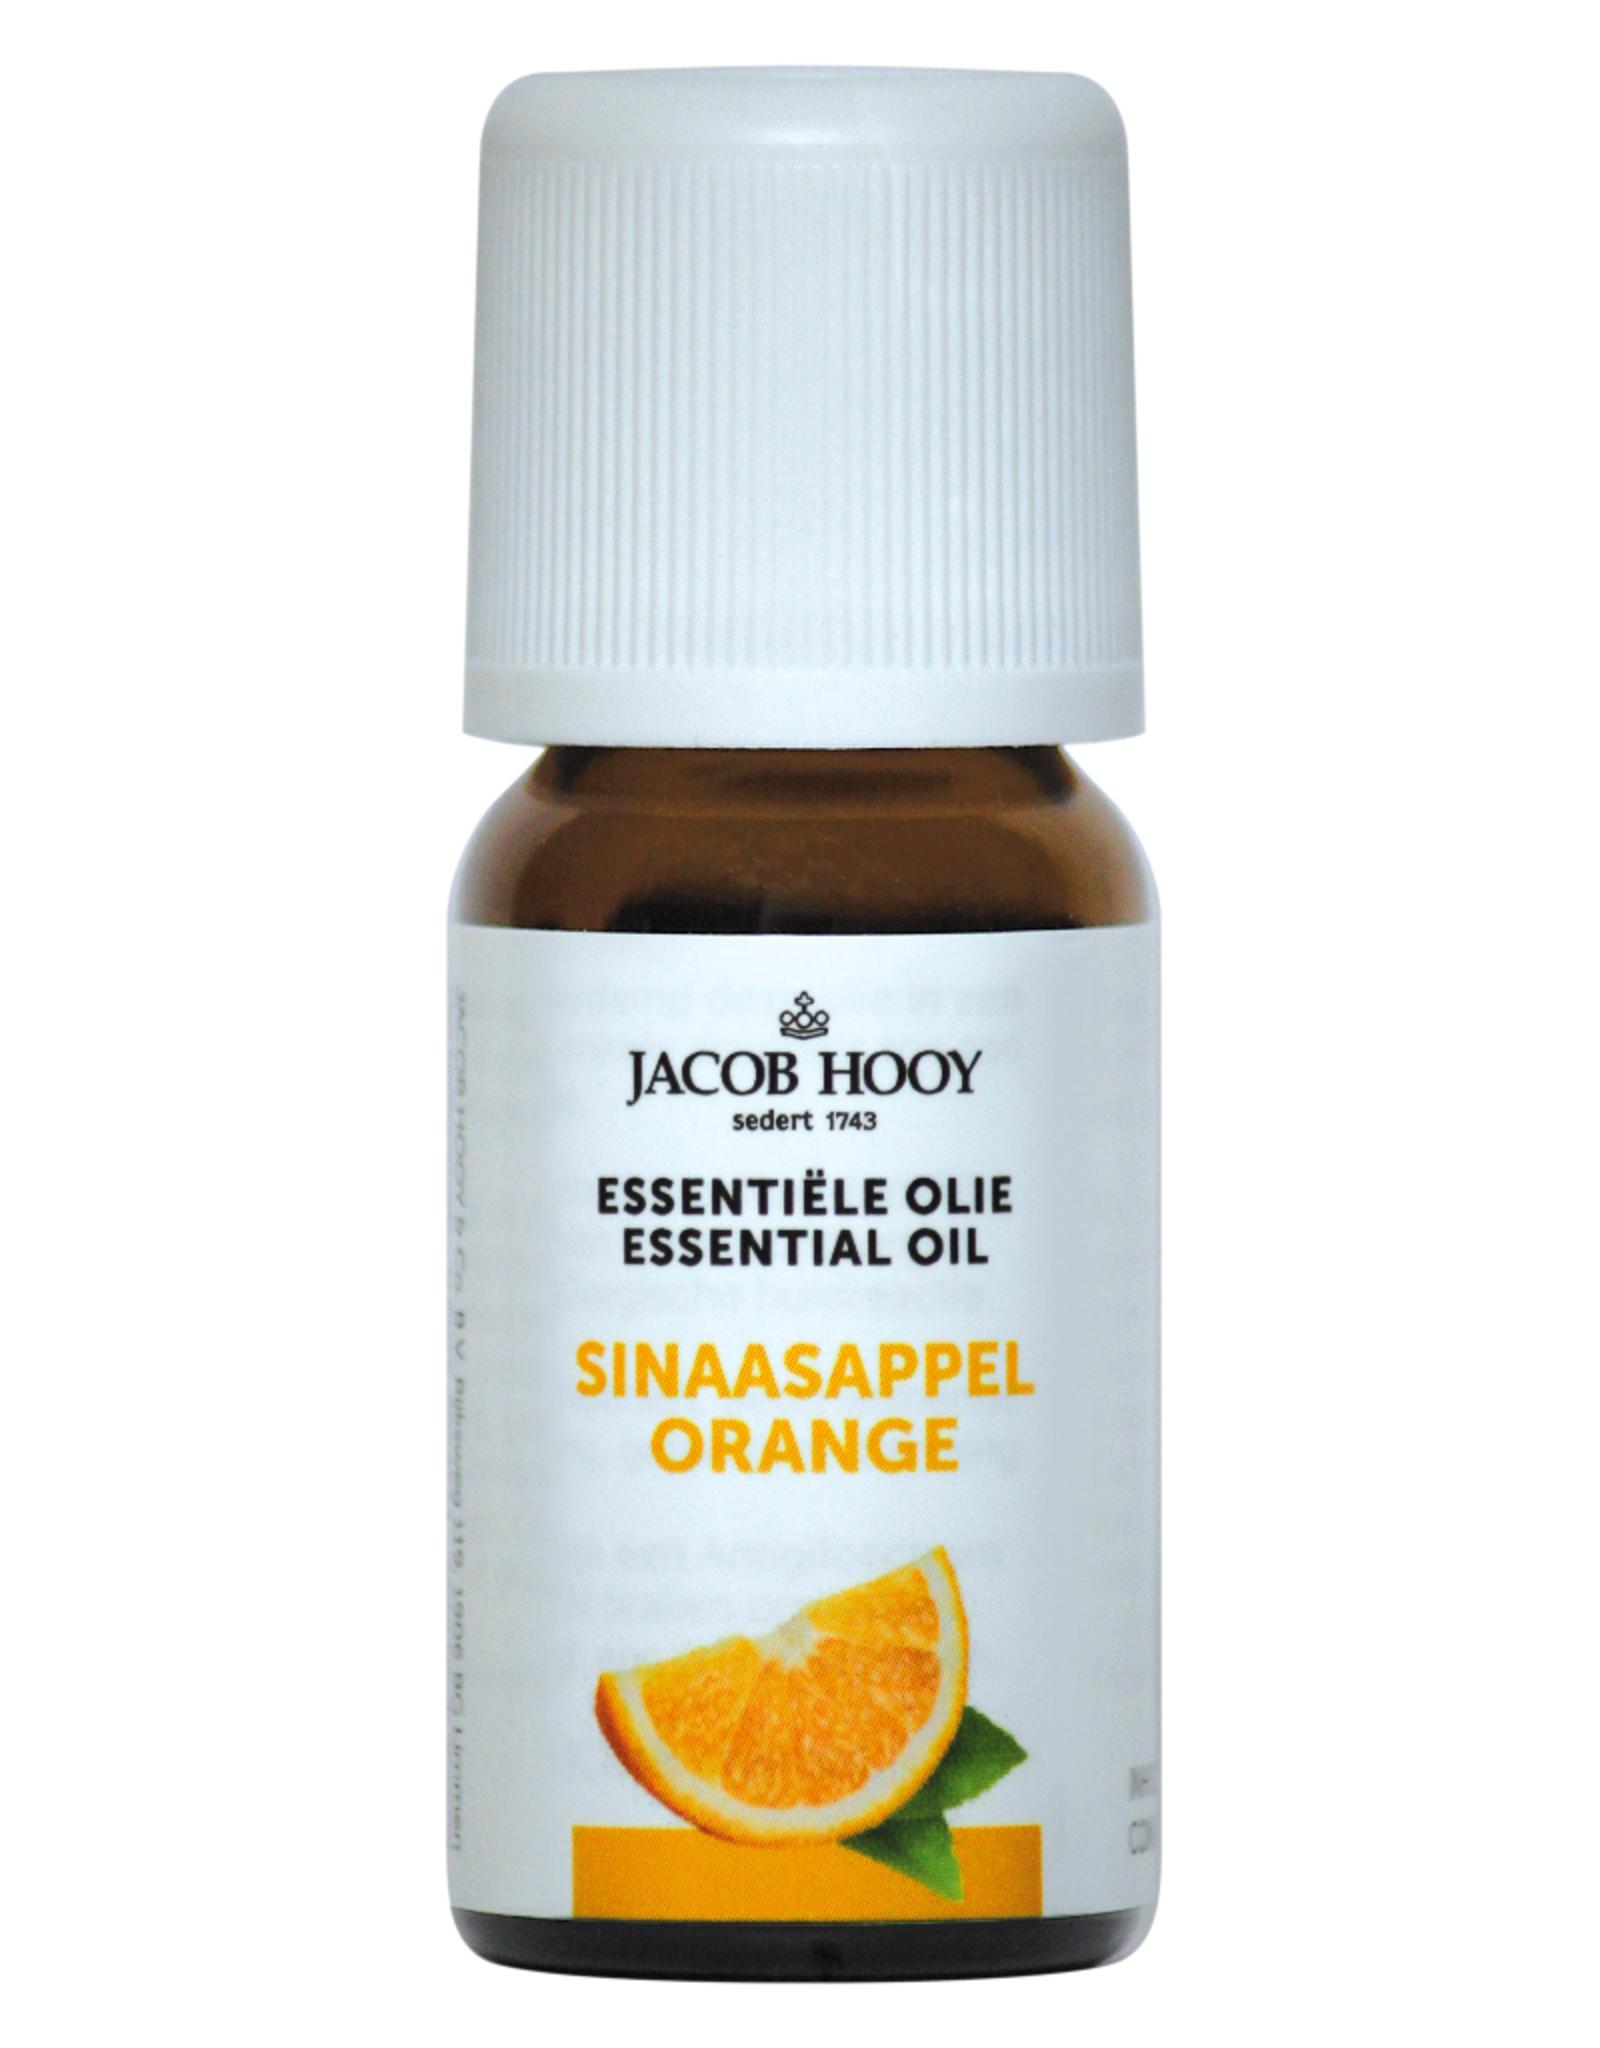 Sinaasappel essentiële olie Jacob Hooy 10ml